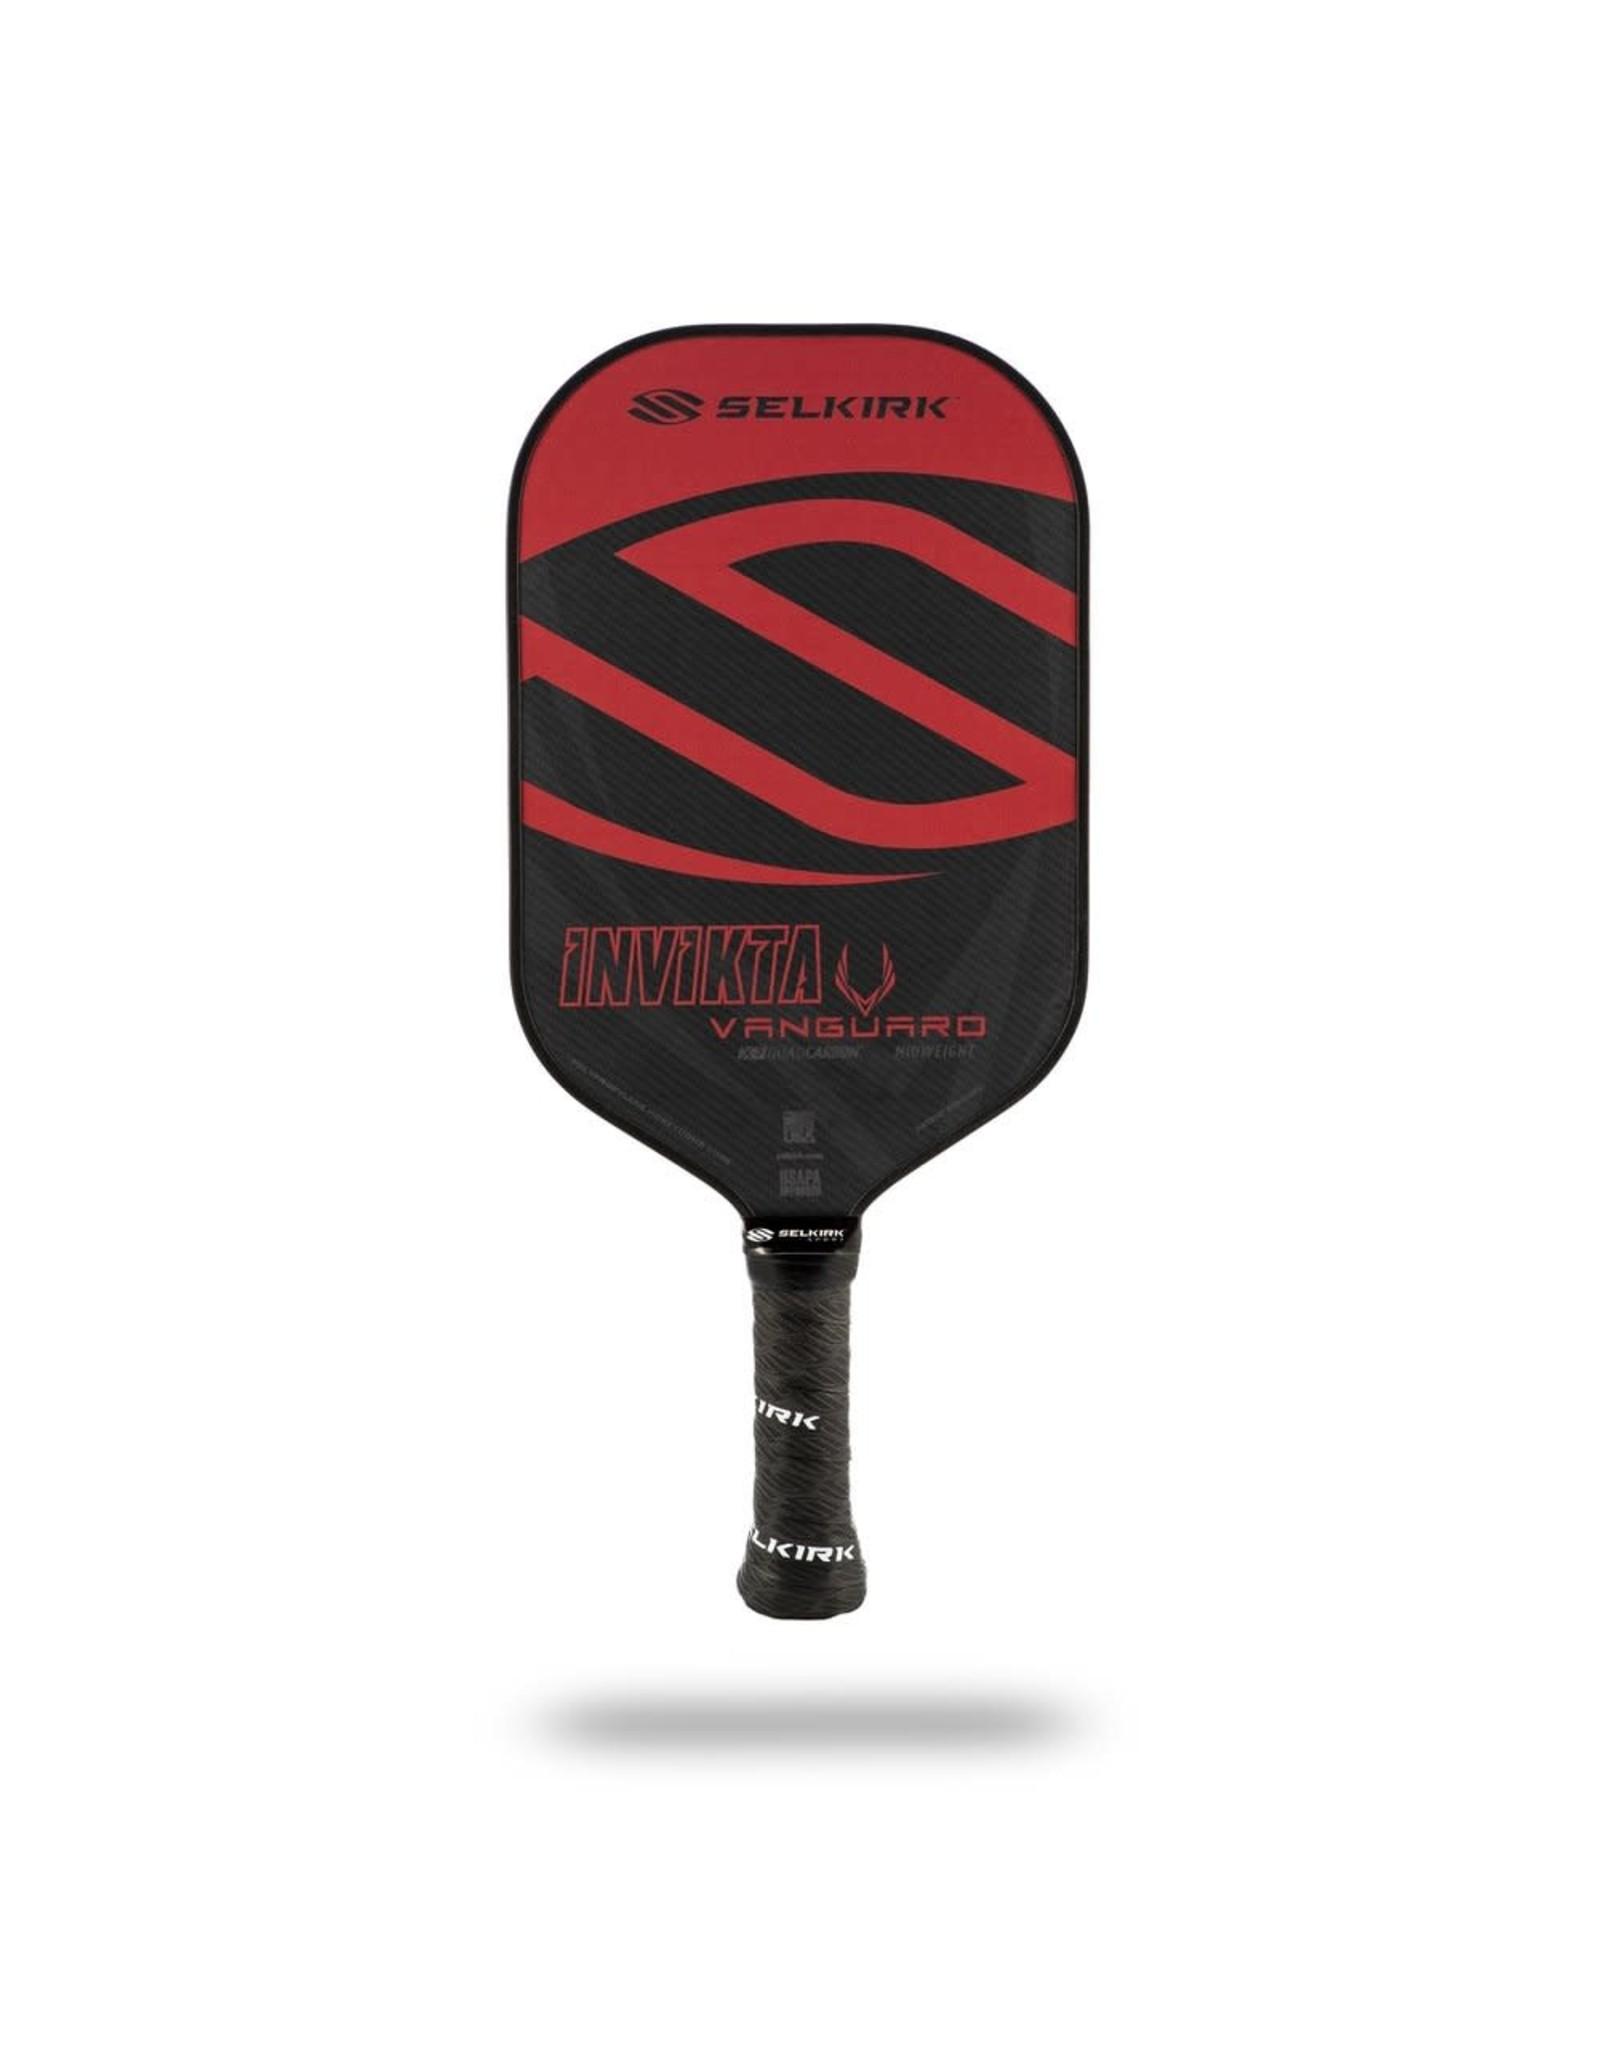 Selkirk Selkirk Vanguard Hybrid Invikta Midweight Crimson Black